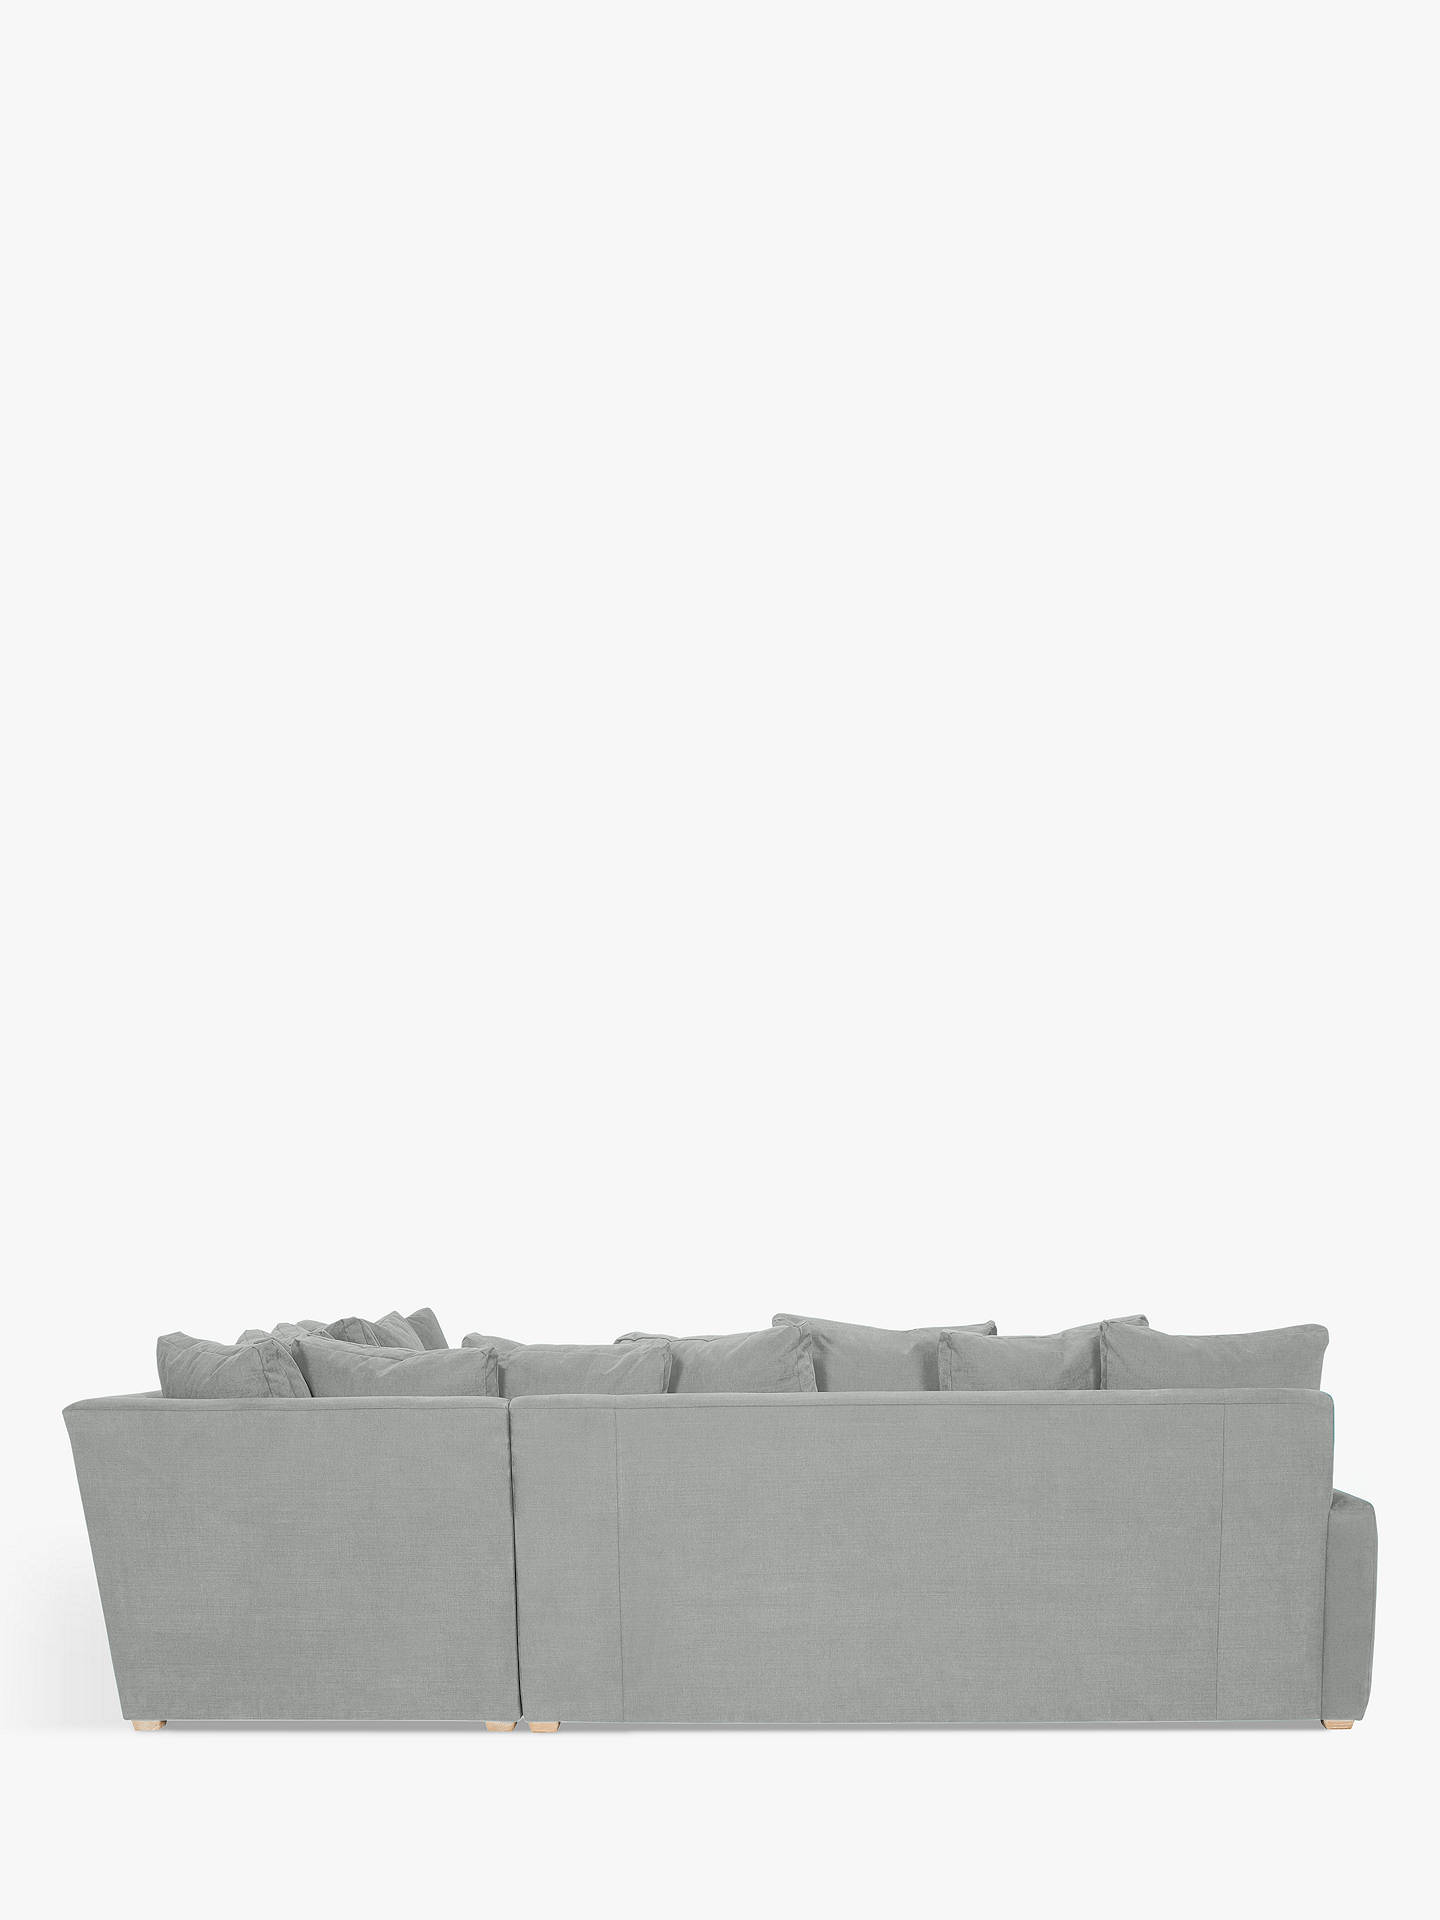 Buy Floppy Jo Large Corner Sofa by Loaf at John Lewis, Clever Softie Pewter Online at johnlewis.com